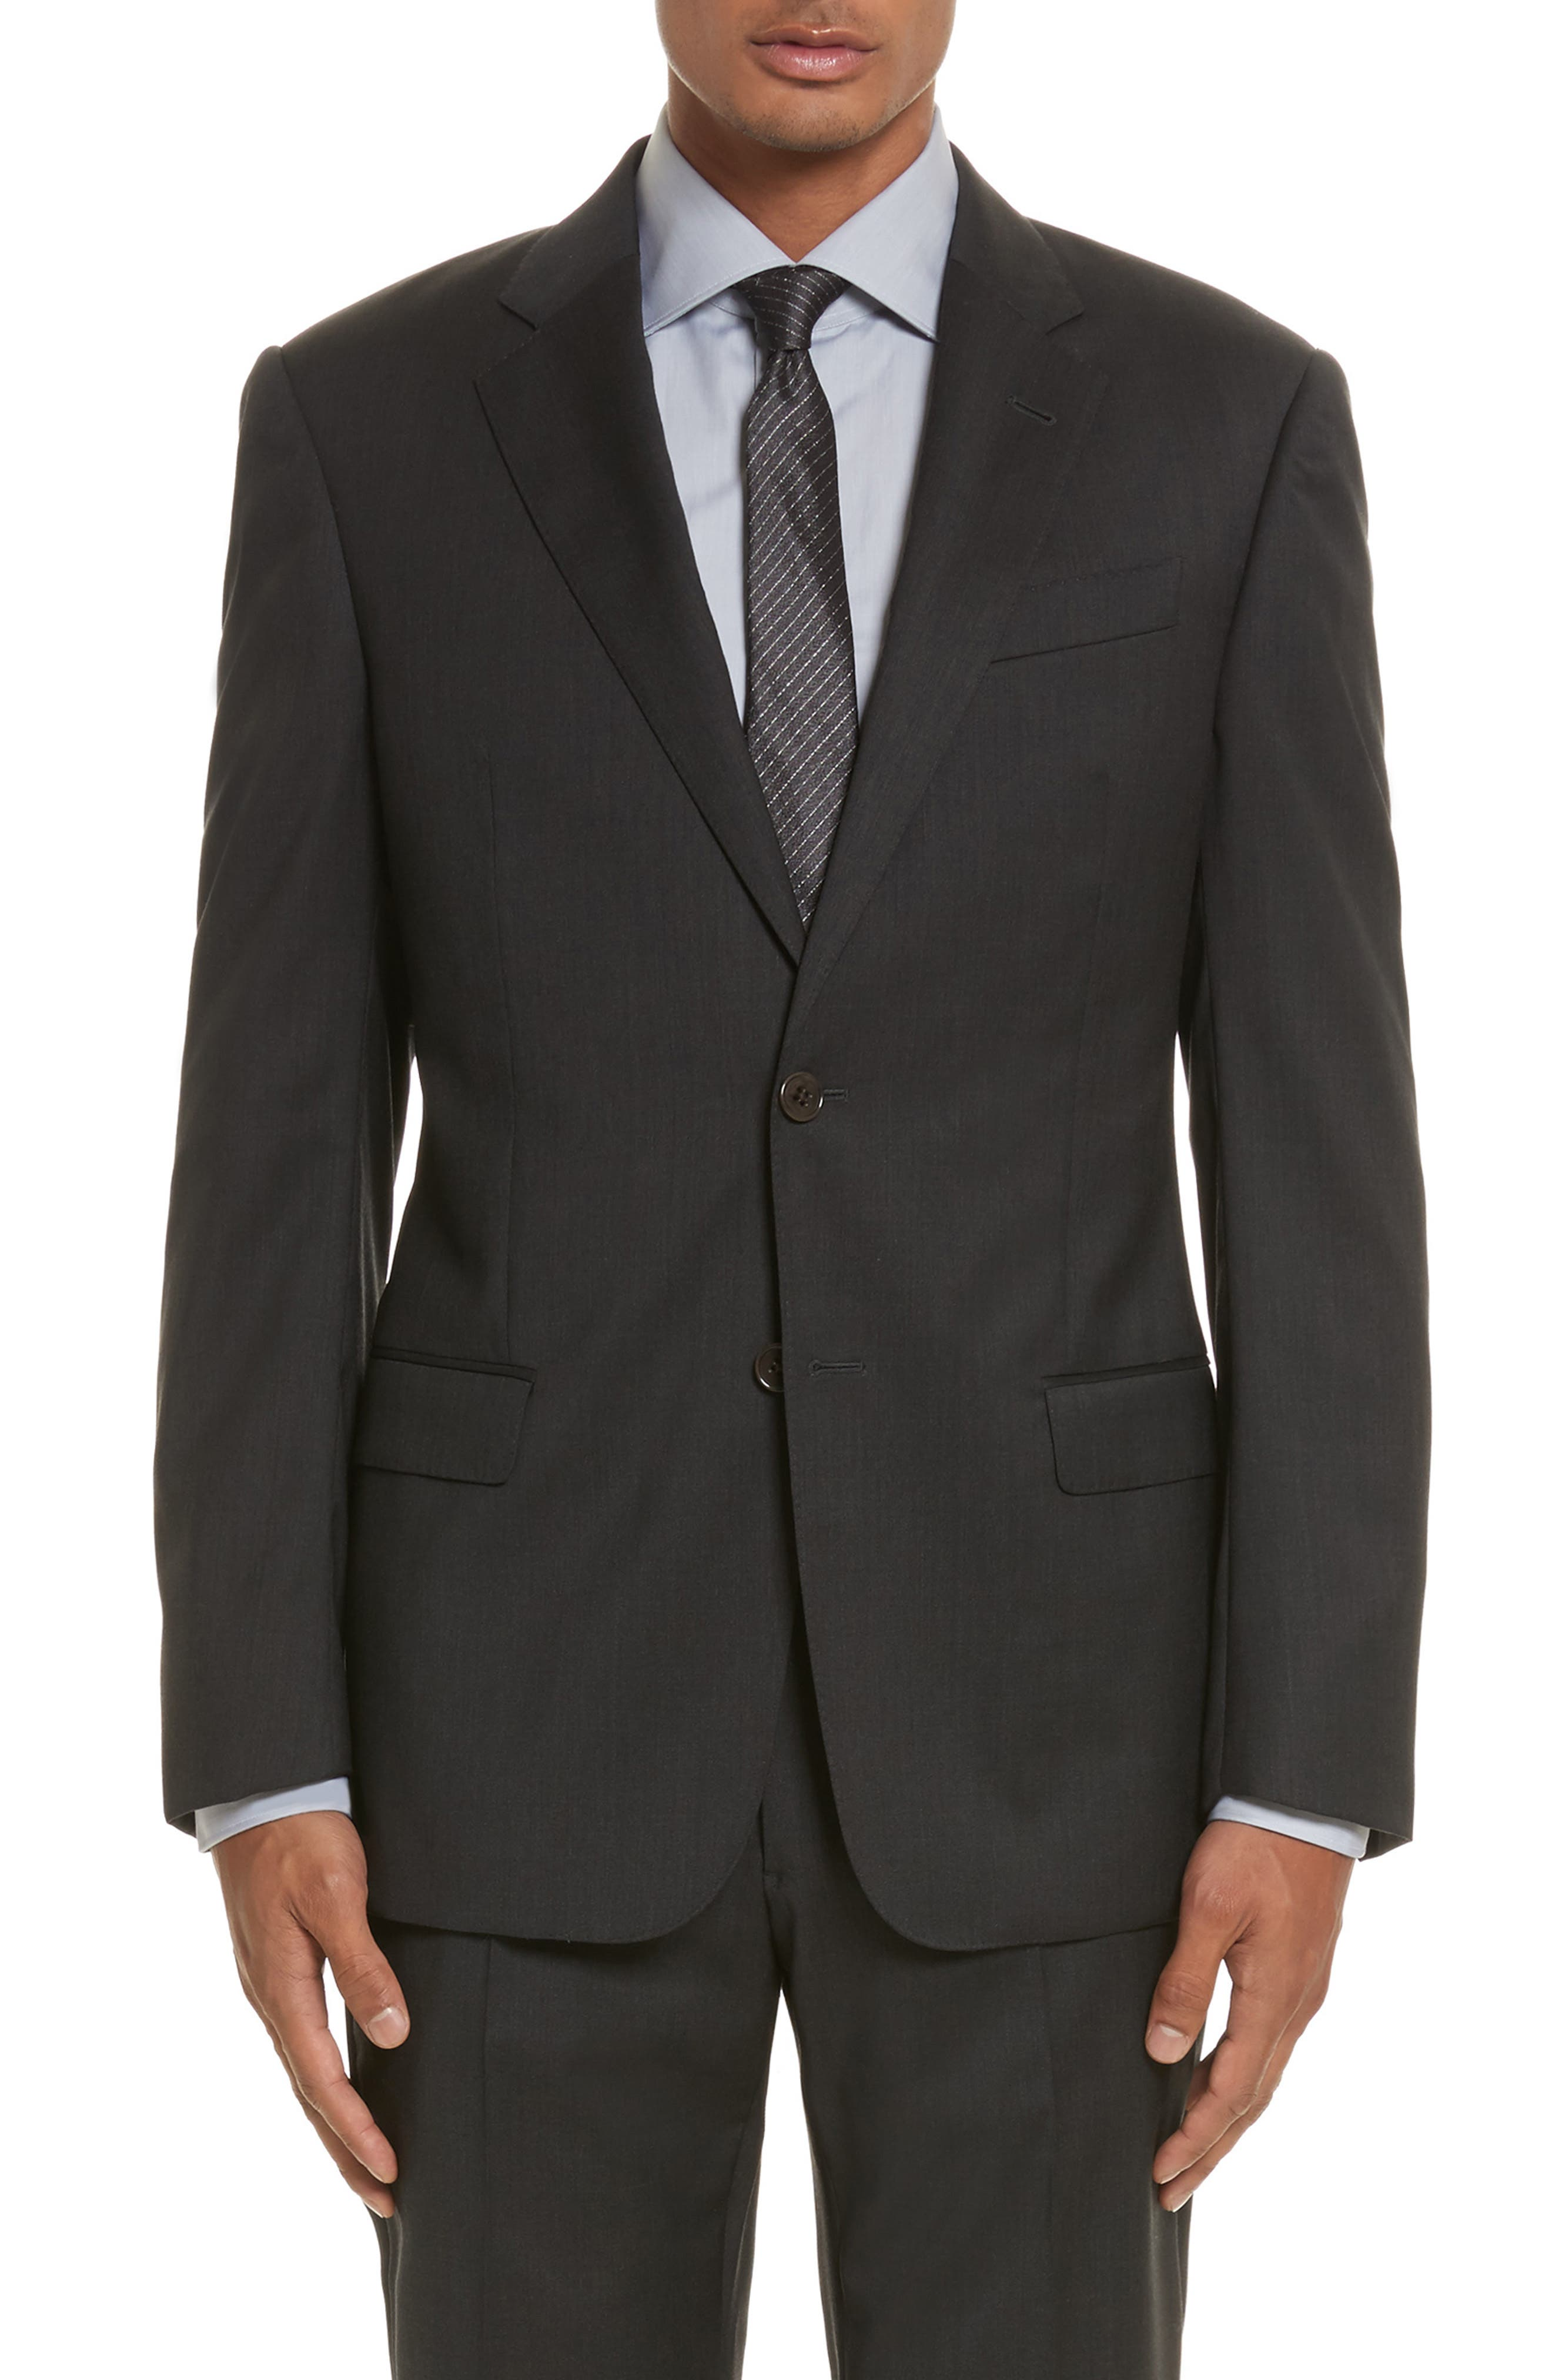 'G-Line' Trim Fit Solid Wool Suit,                             Alternate thumbnail 4, color,                             Charcoal